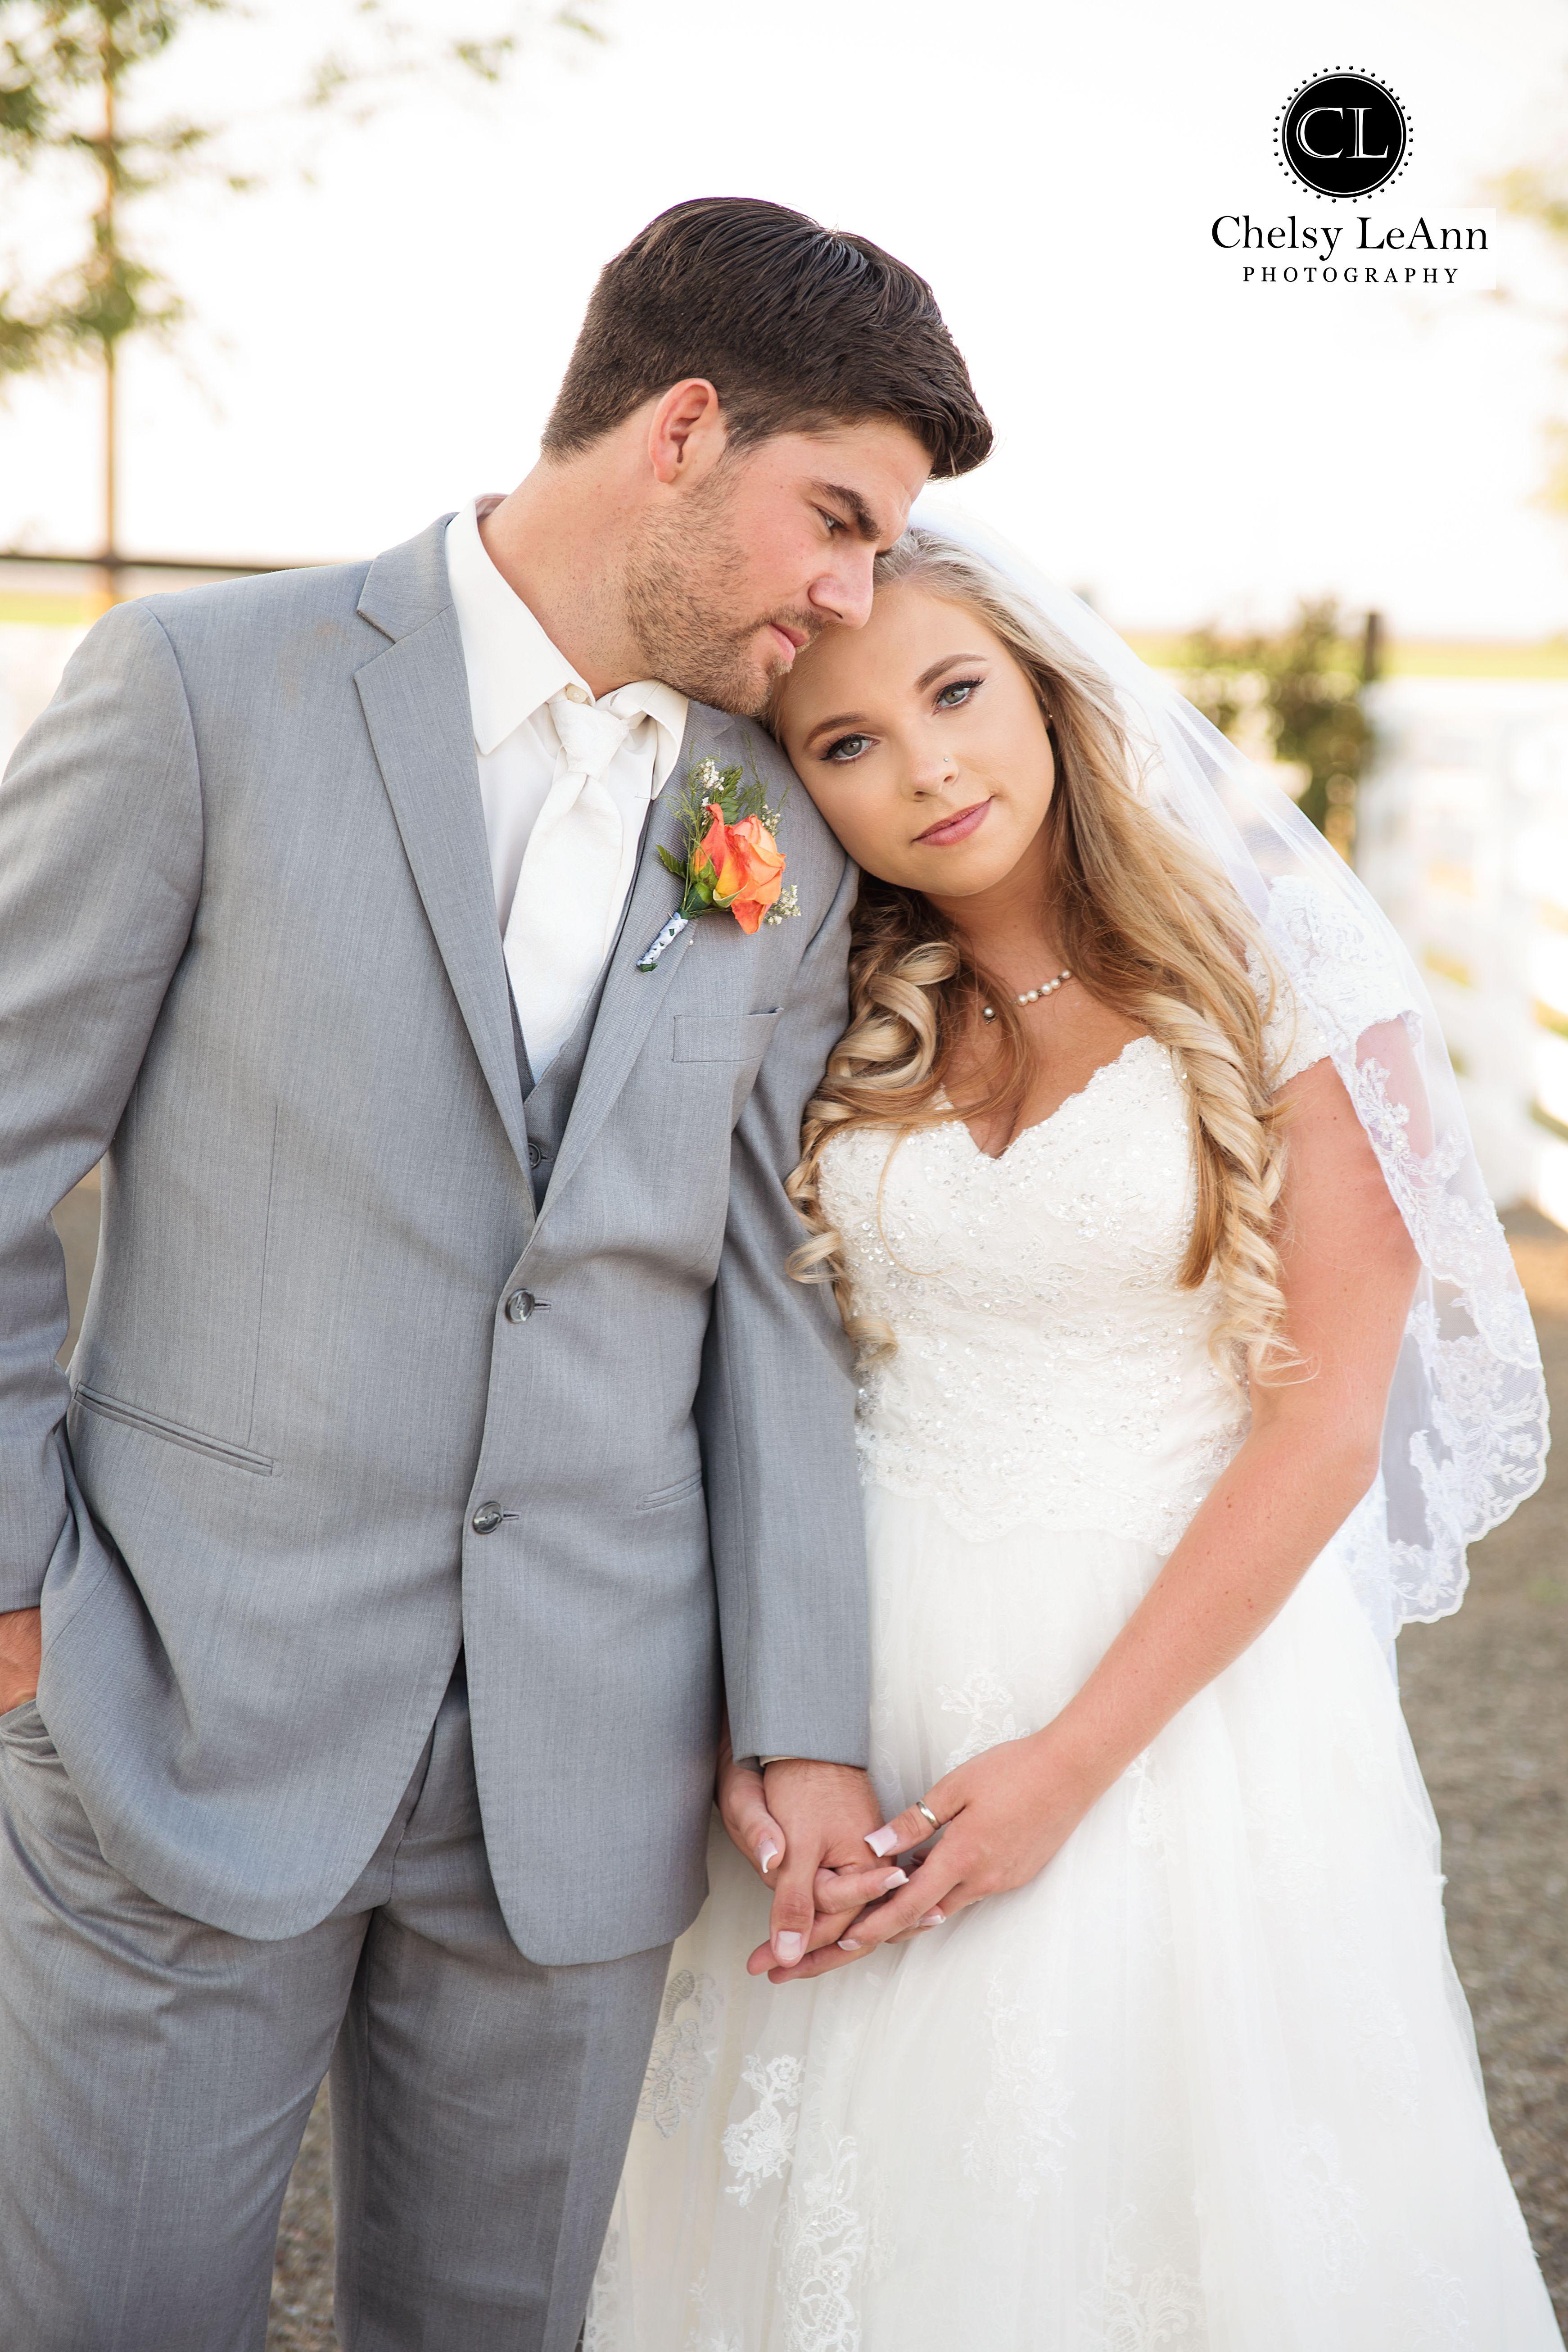 Wedding decor wedding colors ideas Couple Portraits